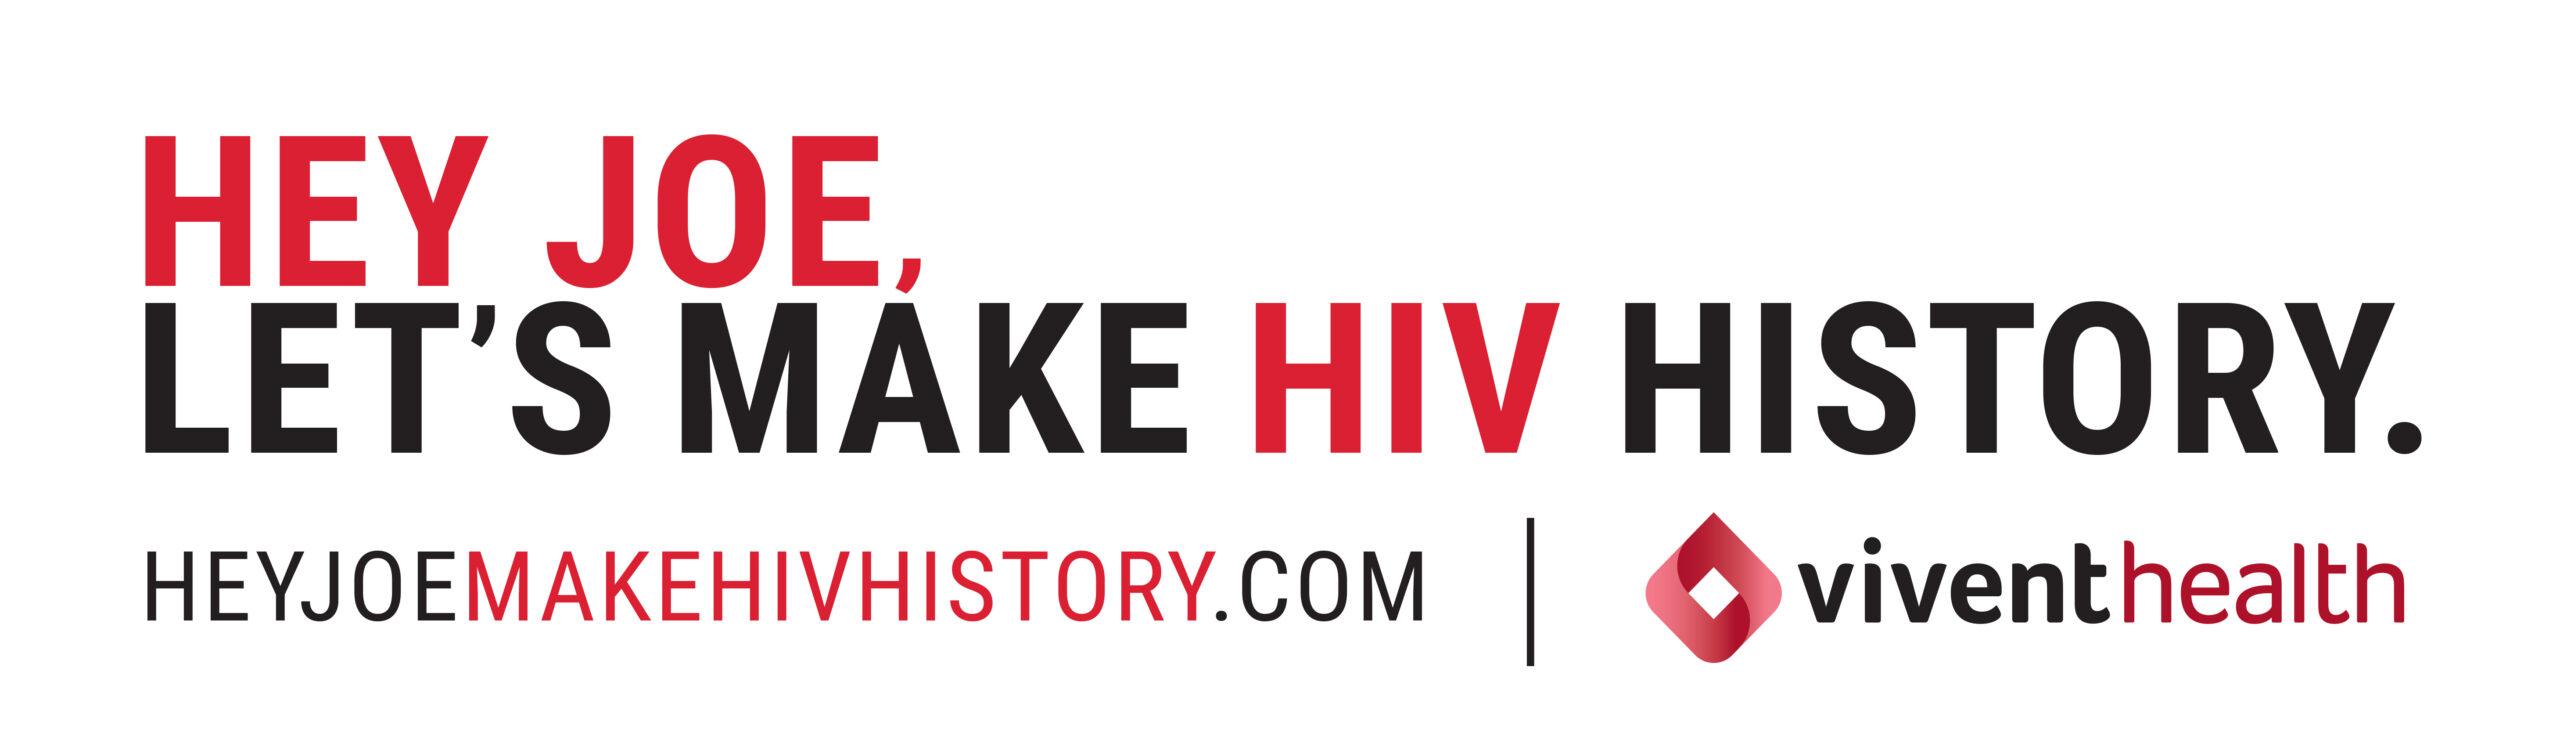 Hey Joe, Make HIV History